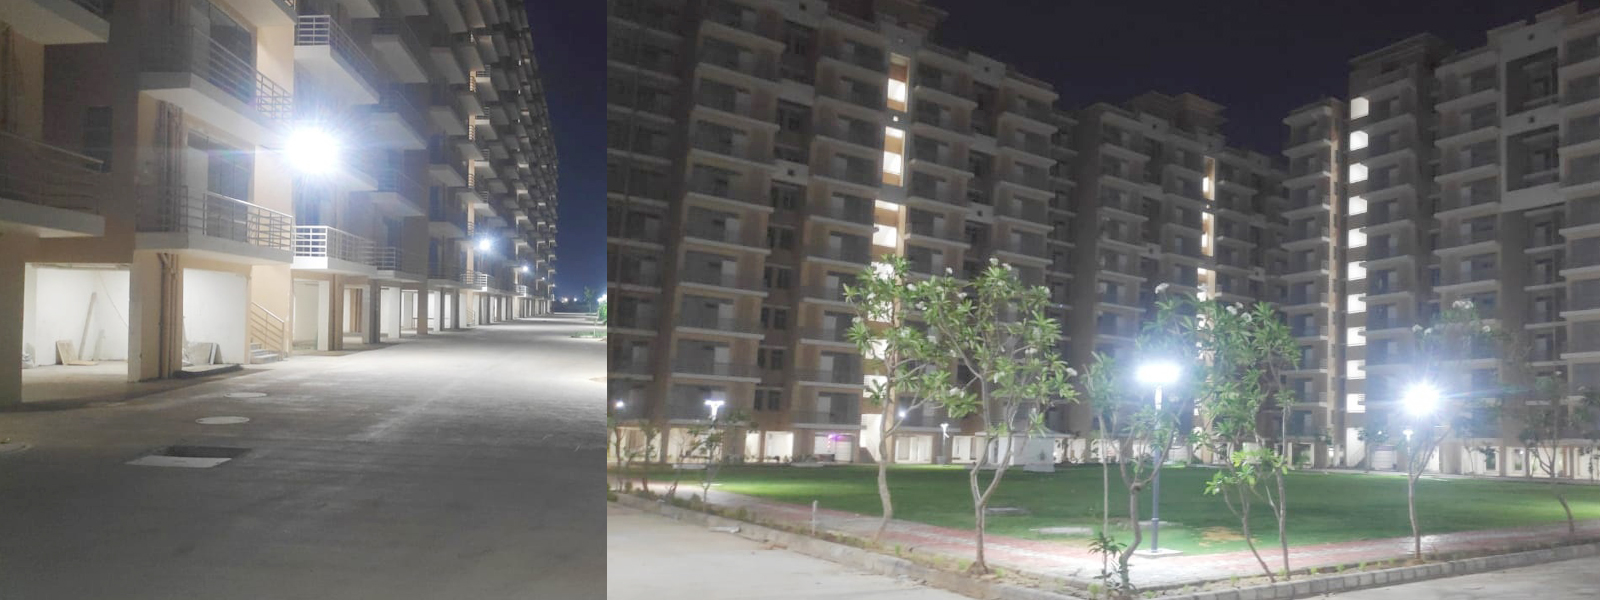 hcbs-Sohna-Gurgaon